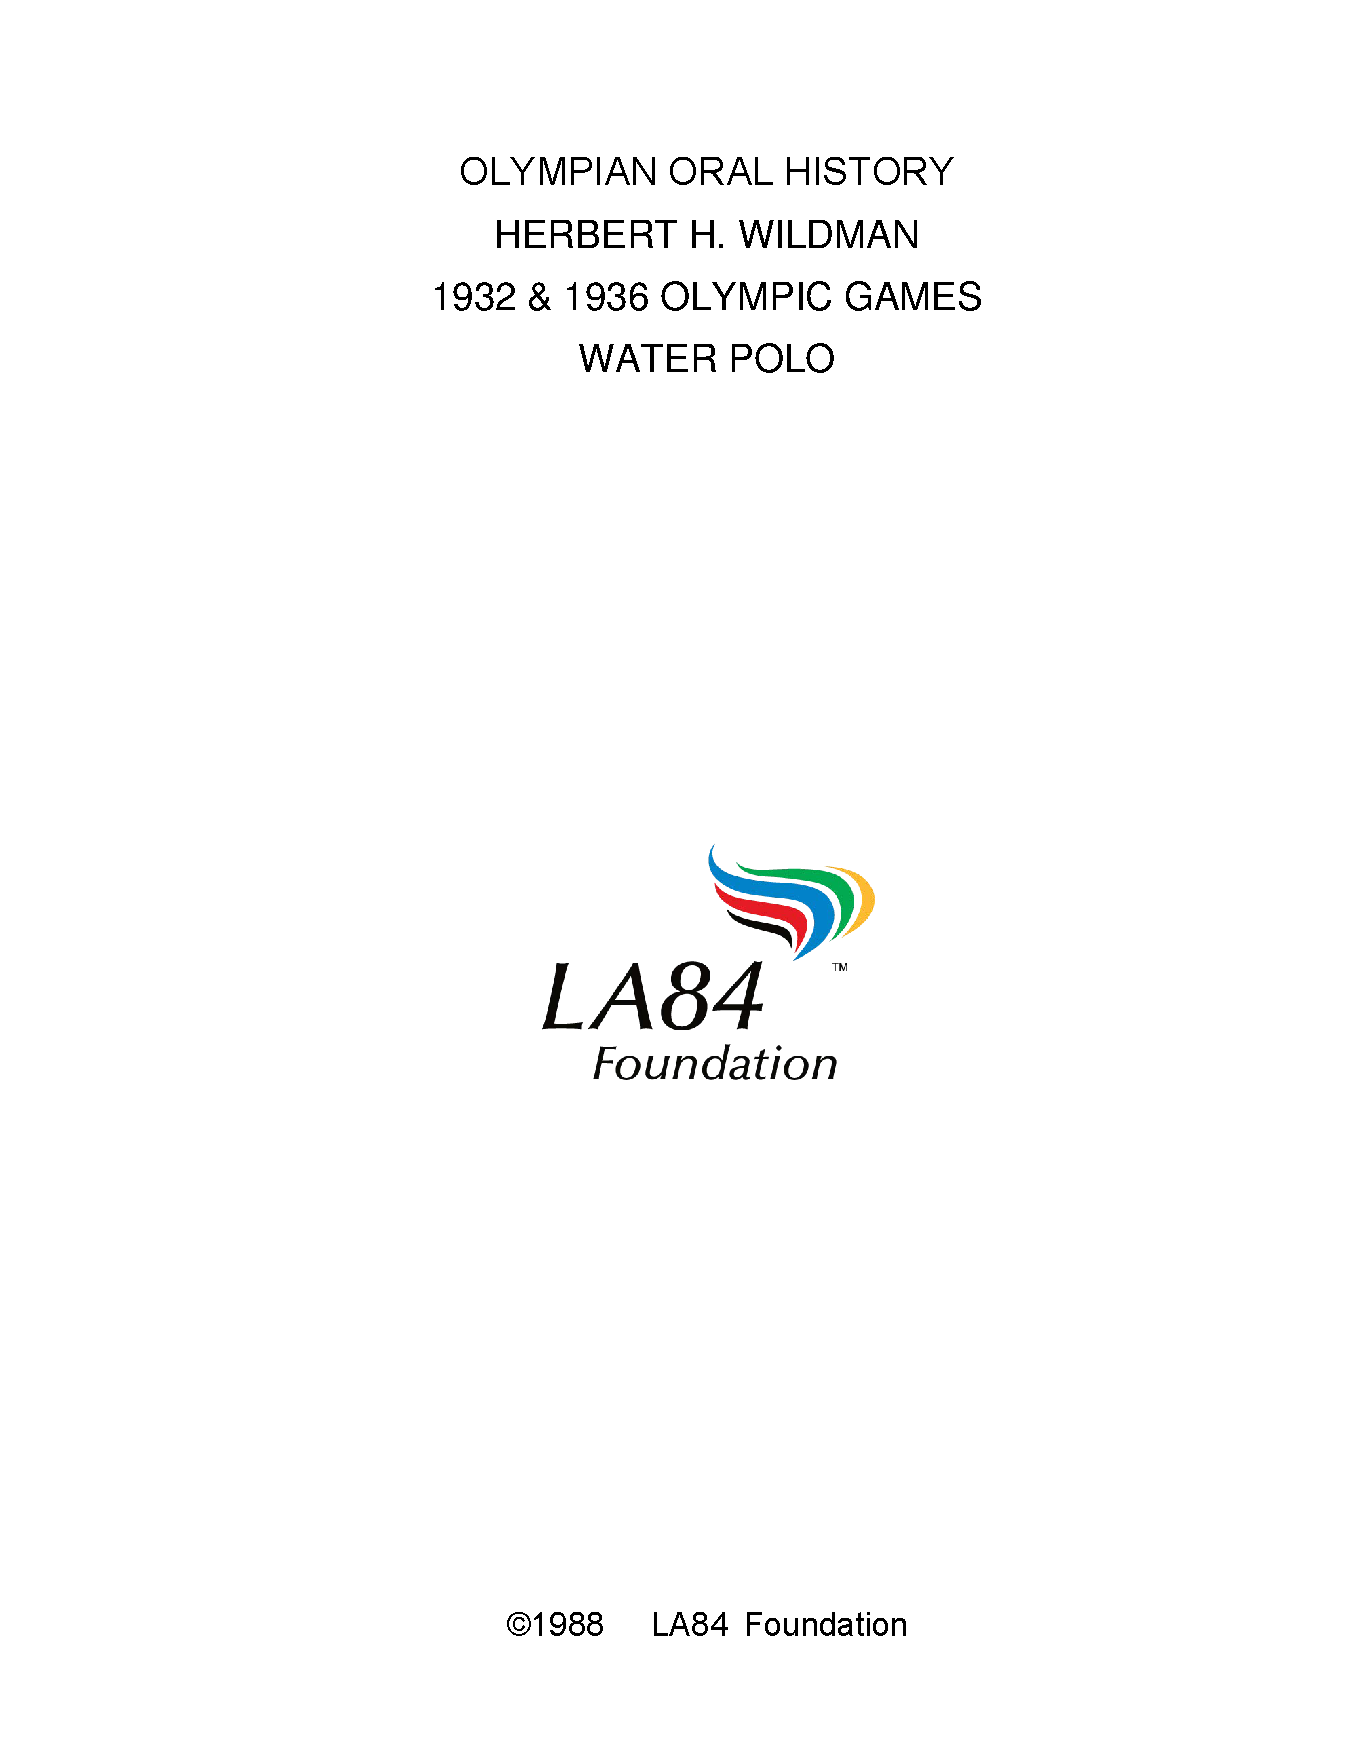 An Olympian's oral history : Herbert H. Wildman, 1932 & 1936 ...